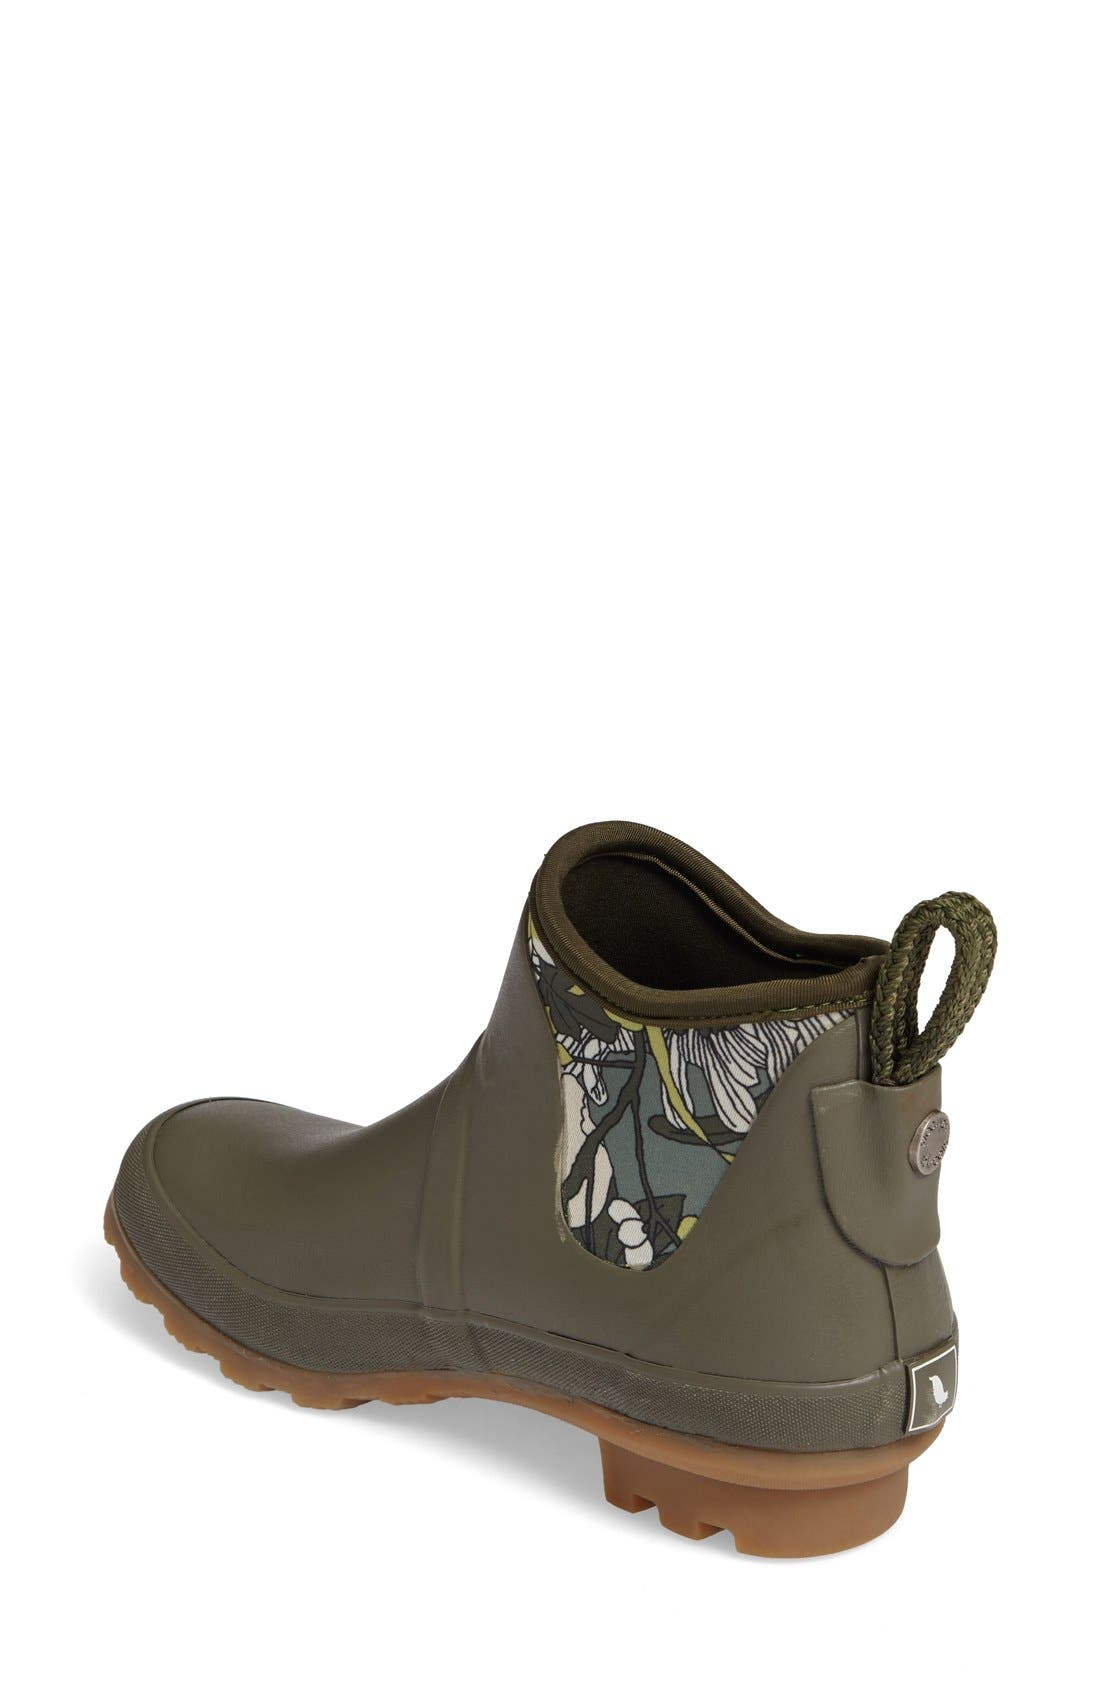 Mano Waterproof Rain Boot,                             Alternate thumbnail 2, color,                             Olive Flower Power